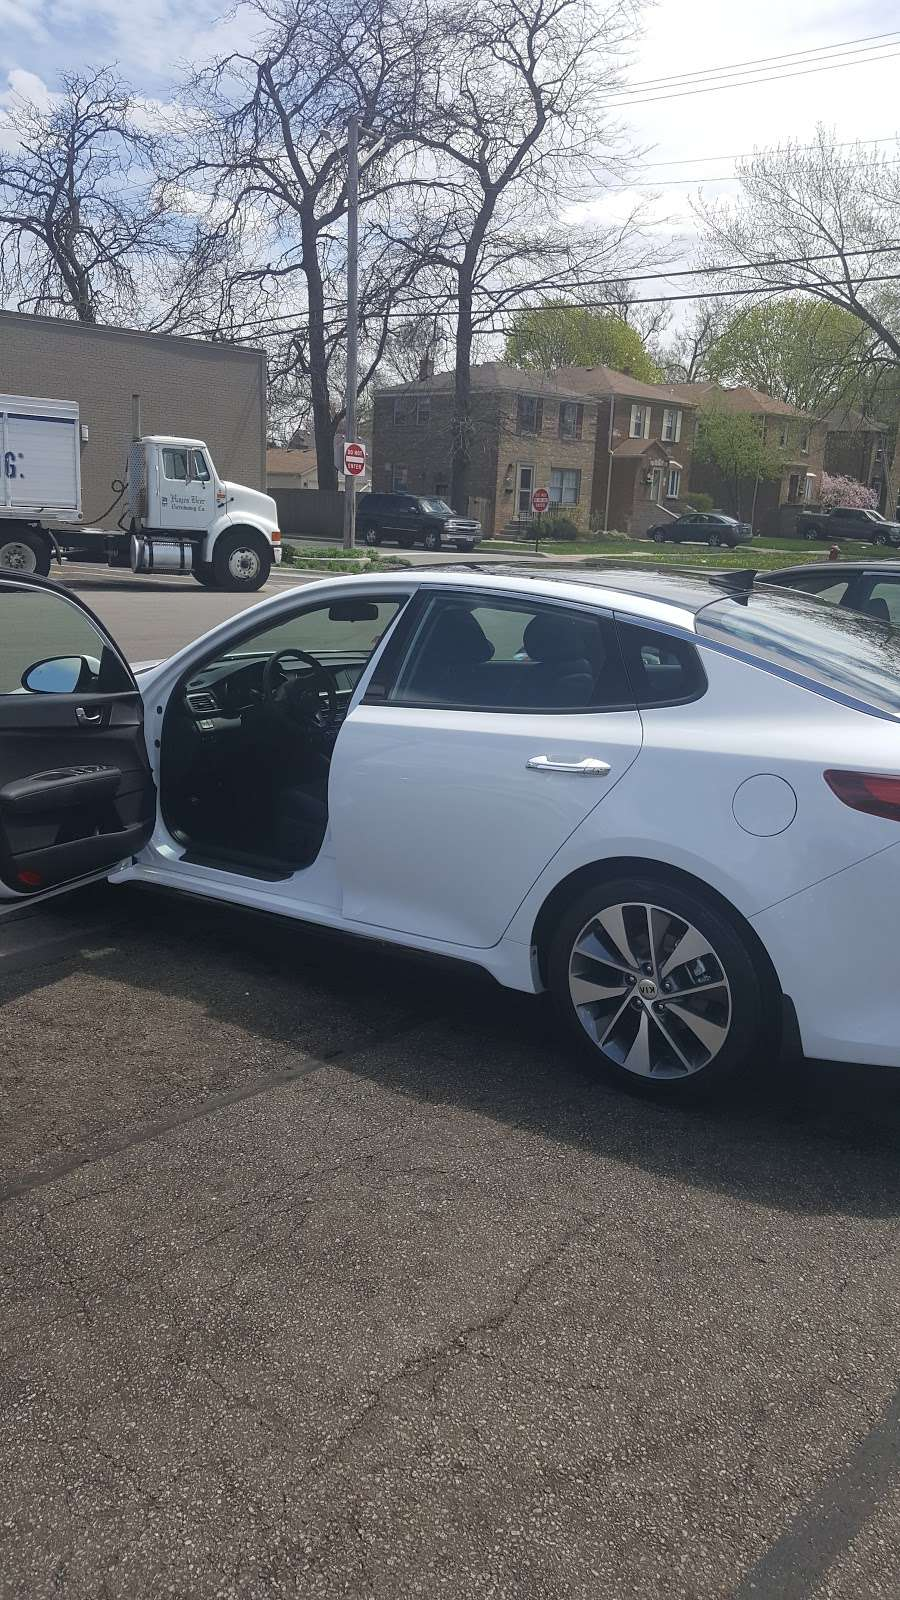 Evergreen Car Wash - car wash  | Photo 9 of 10 | Address: 3501 95th St, Evergreen Park, IL 60805, USA | Phone: (708) 229-9960